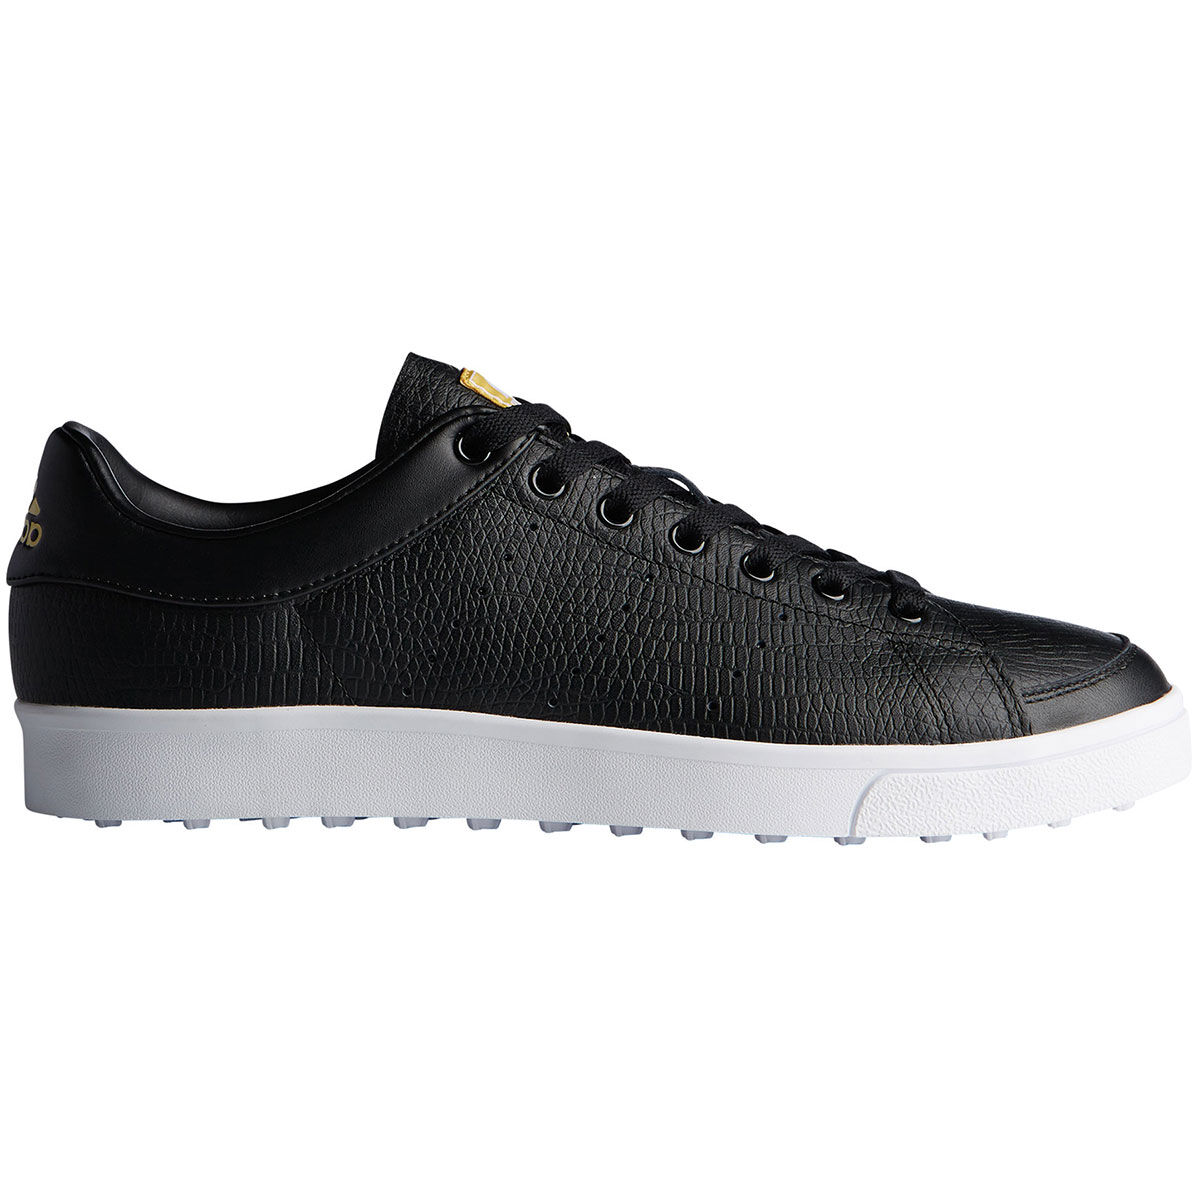 adidas scarpe clacik